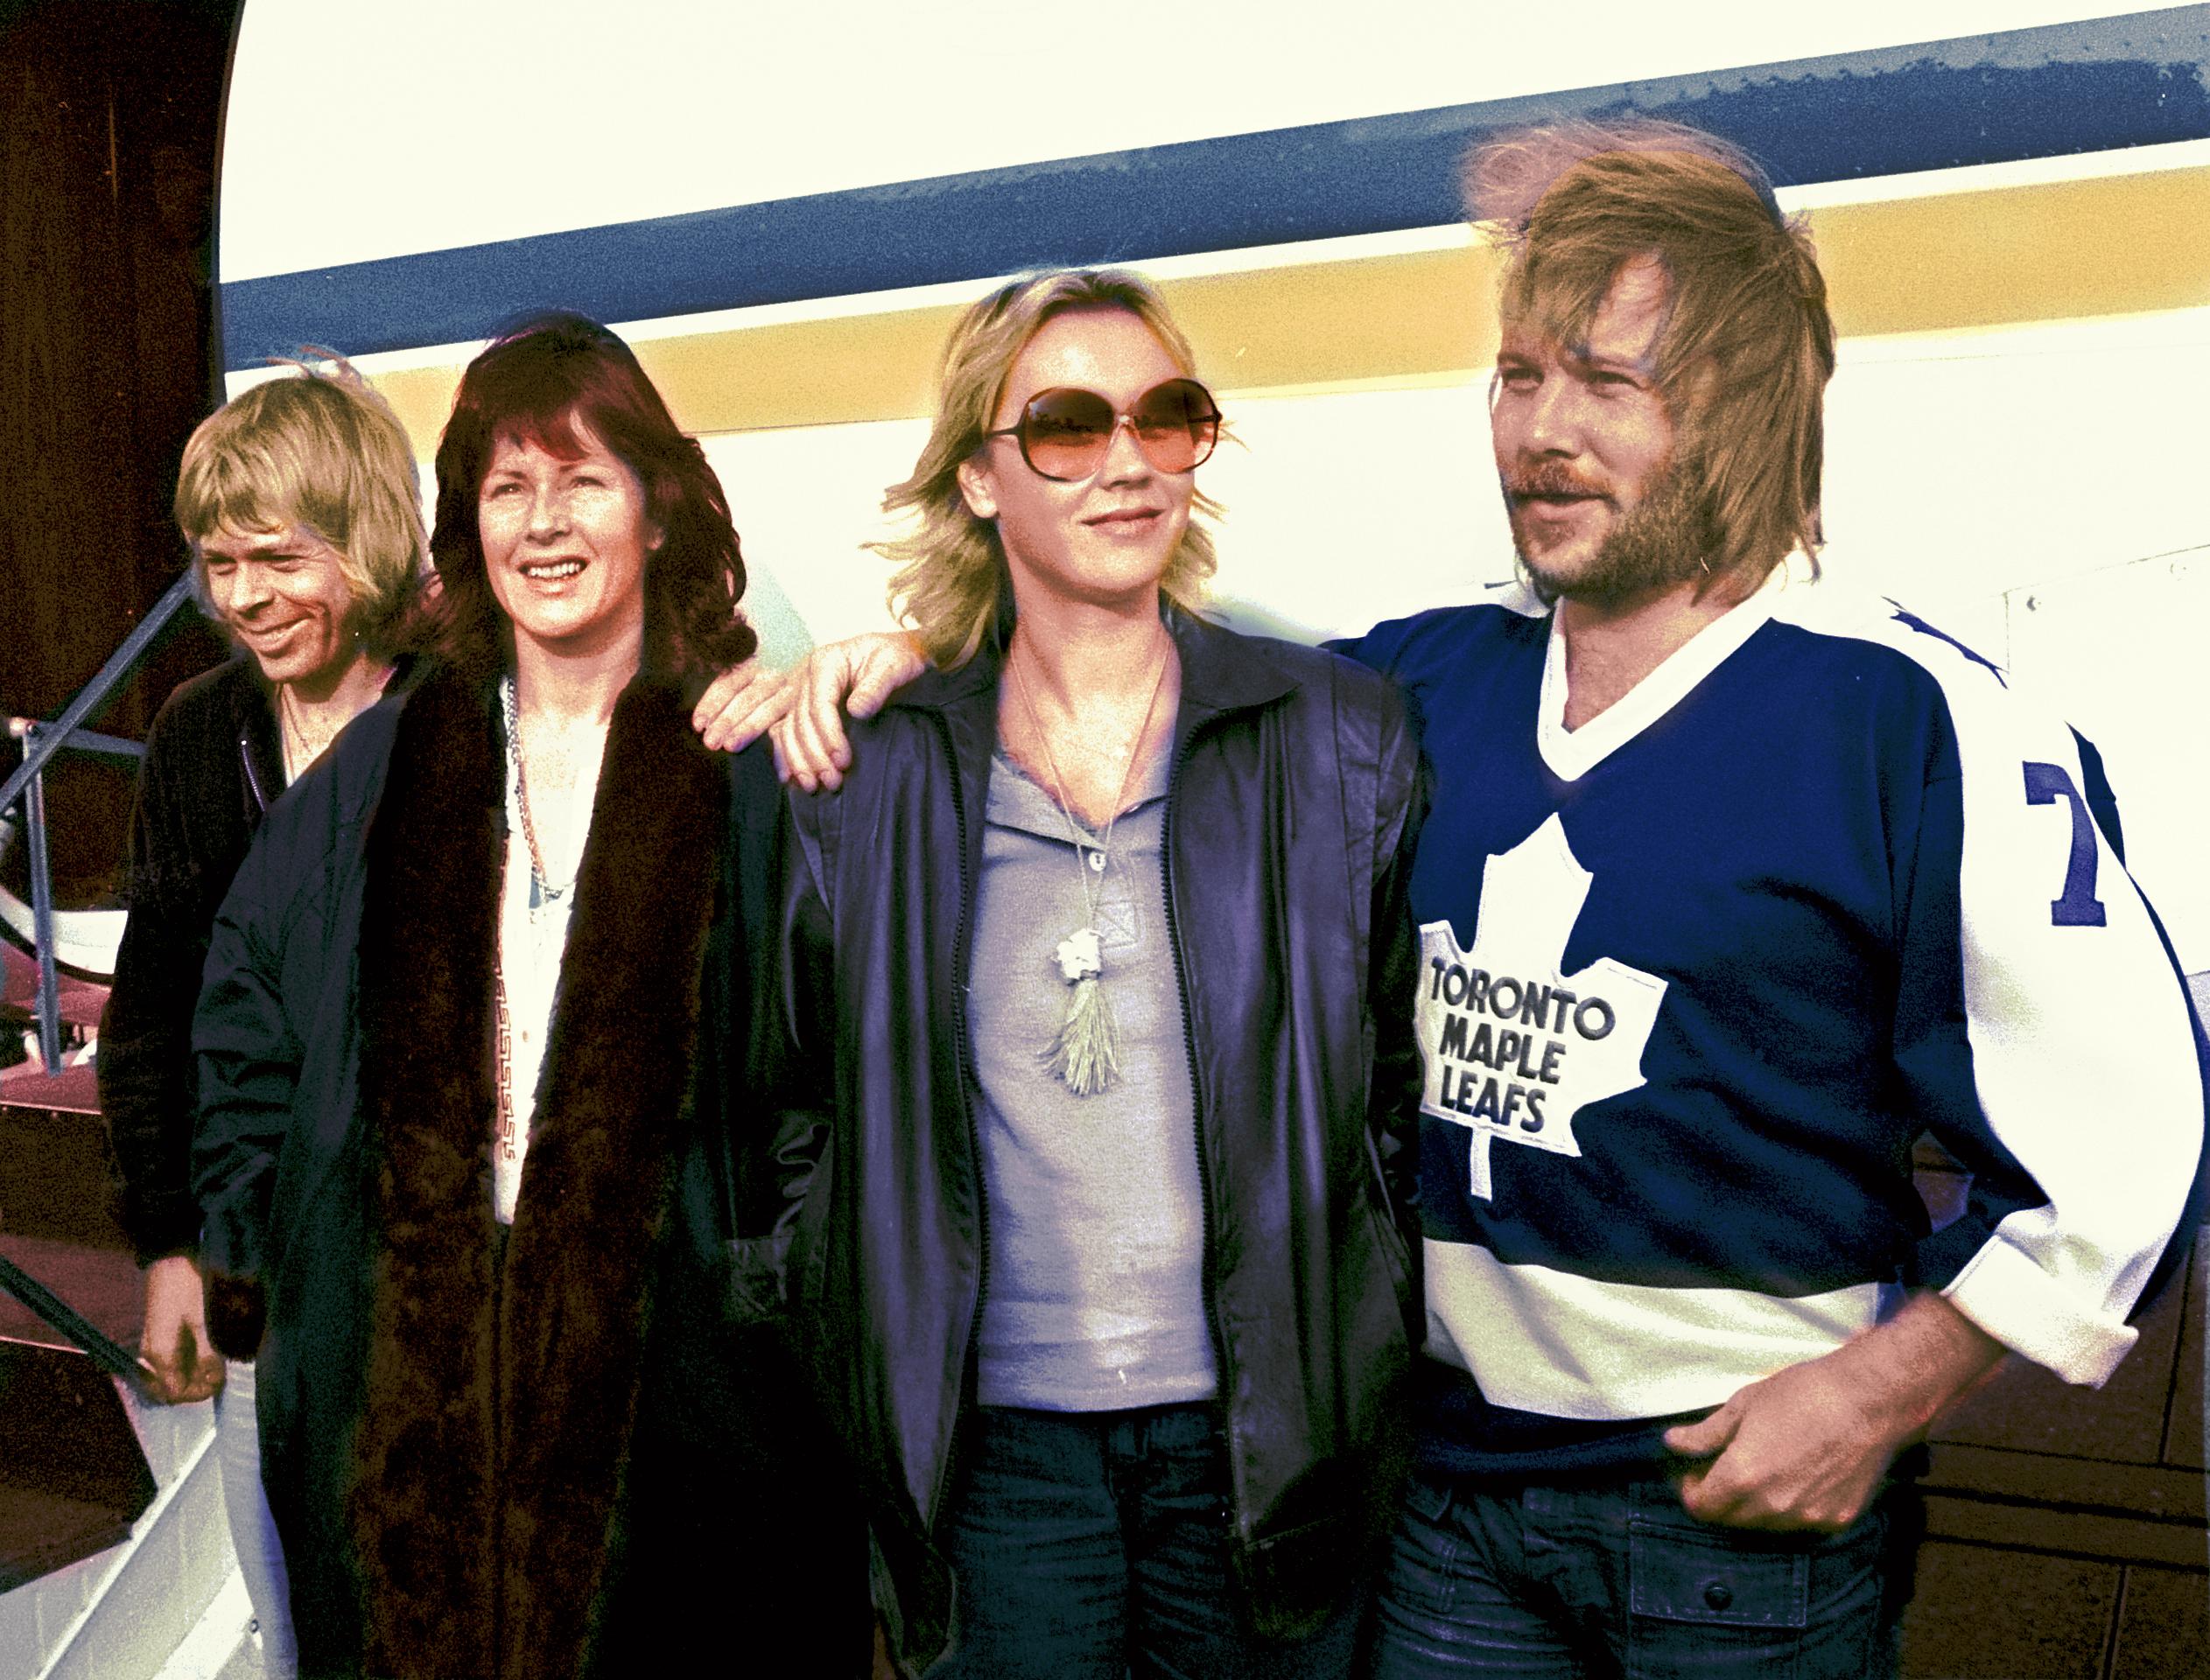 ABBA in Rotterdam (1979) - Fotocredits: Fernando Pereira - Wikimedia Commons (CC BY-SA 3.0 NL)